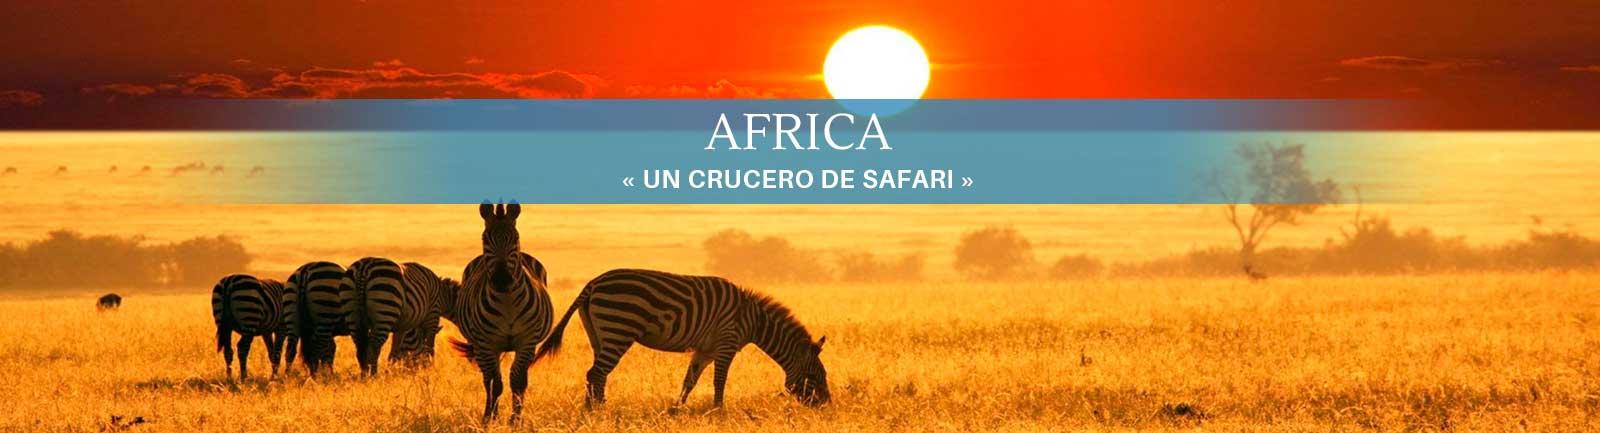 Destino Africa